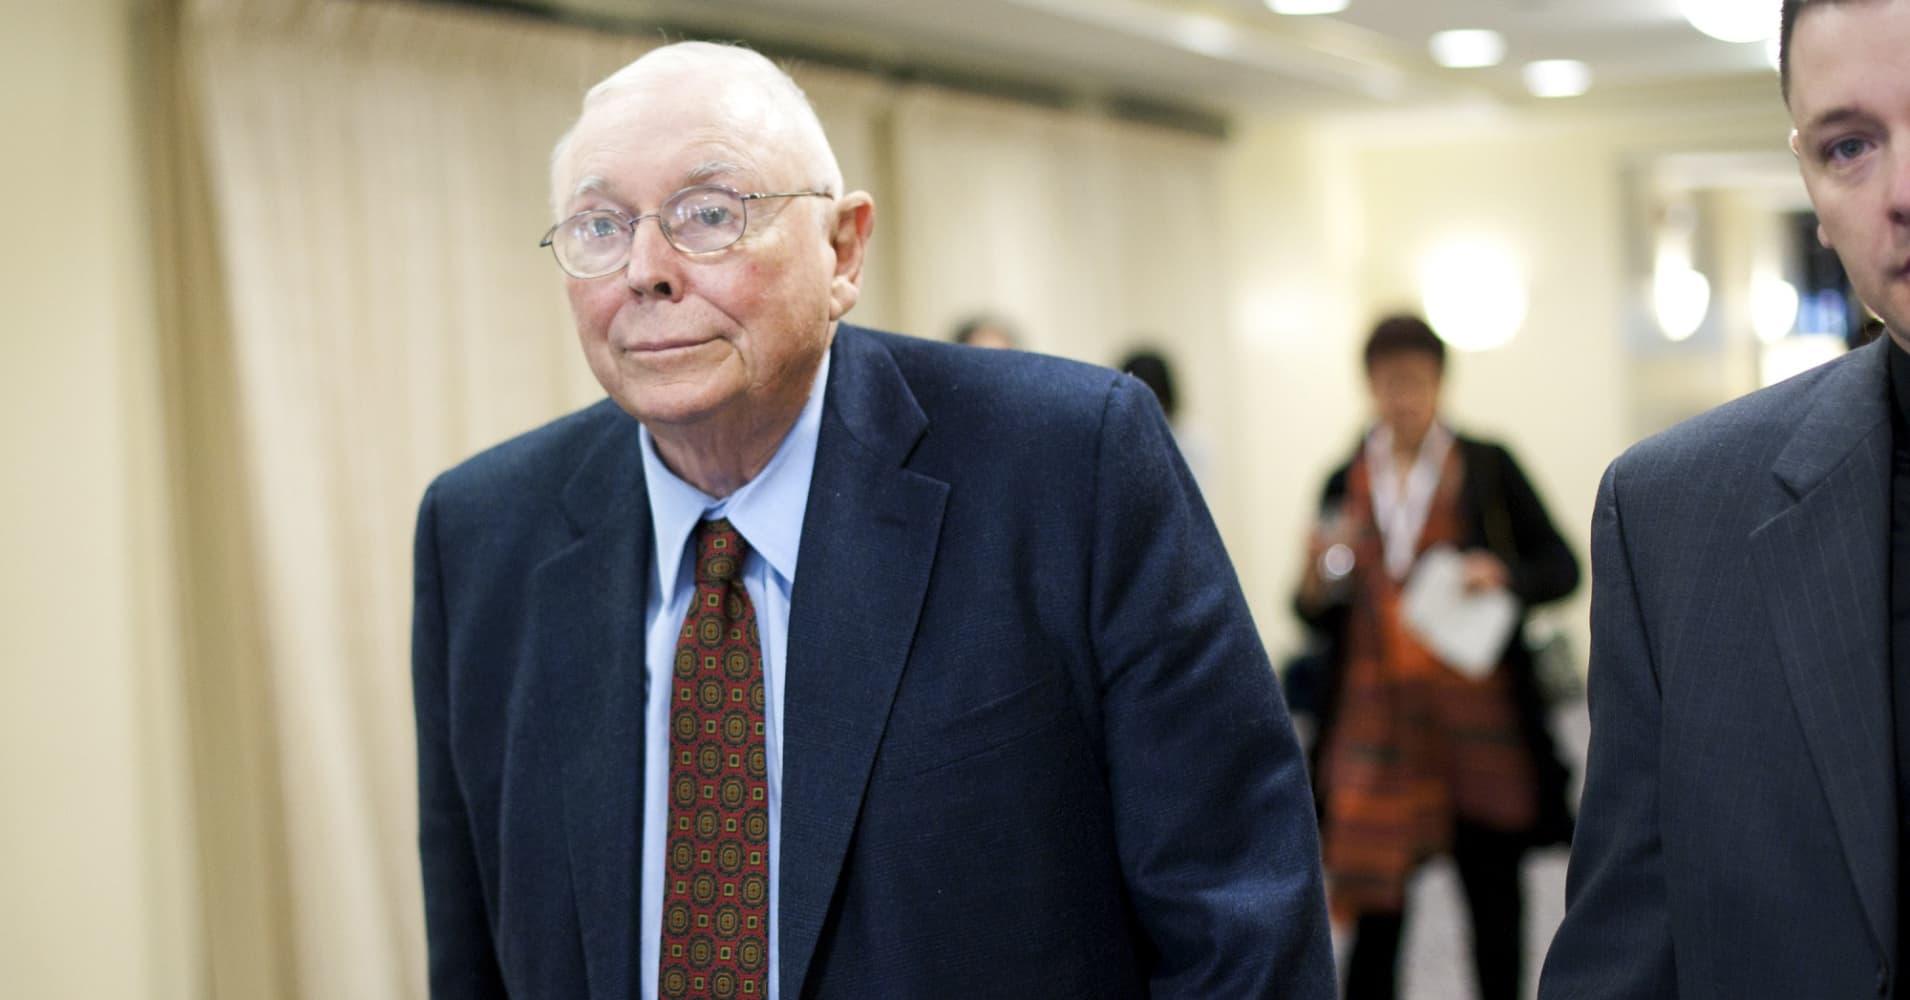 Charles Munger, vice chairman of Berkshire Hathaway